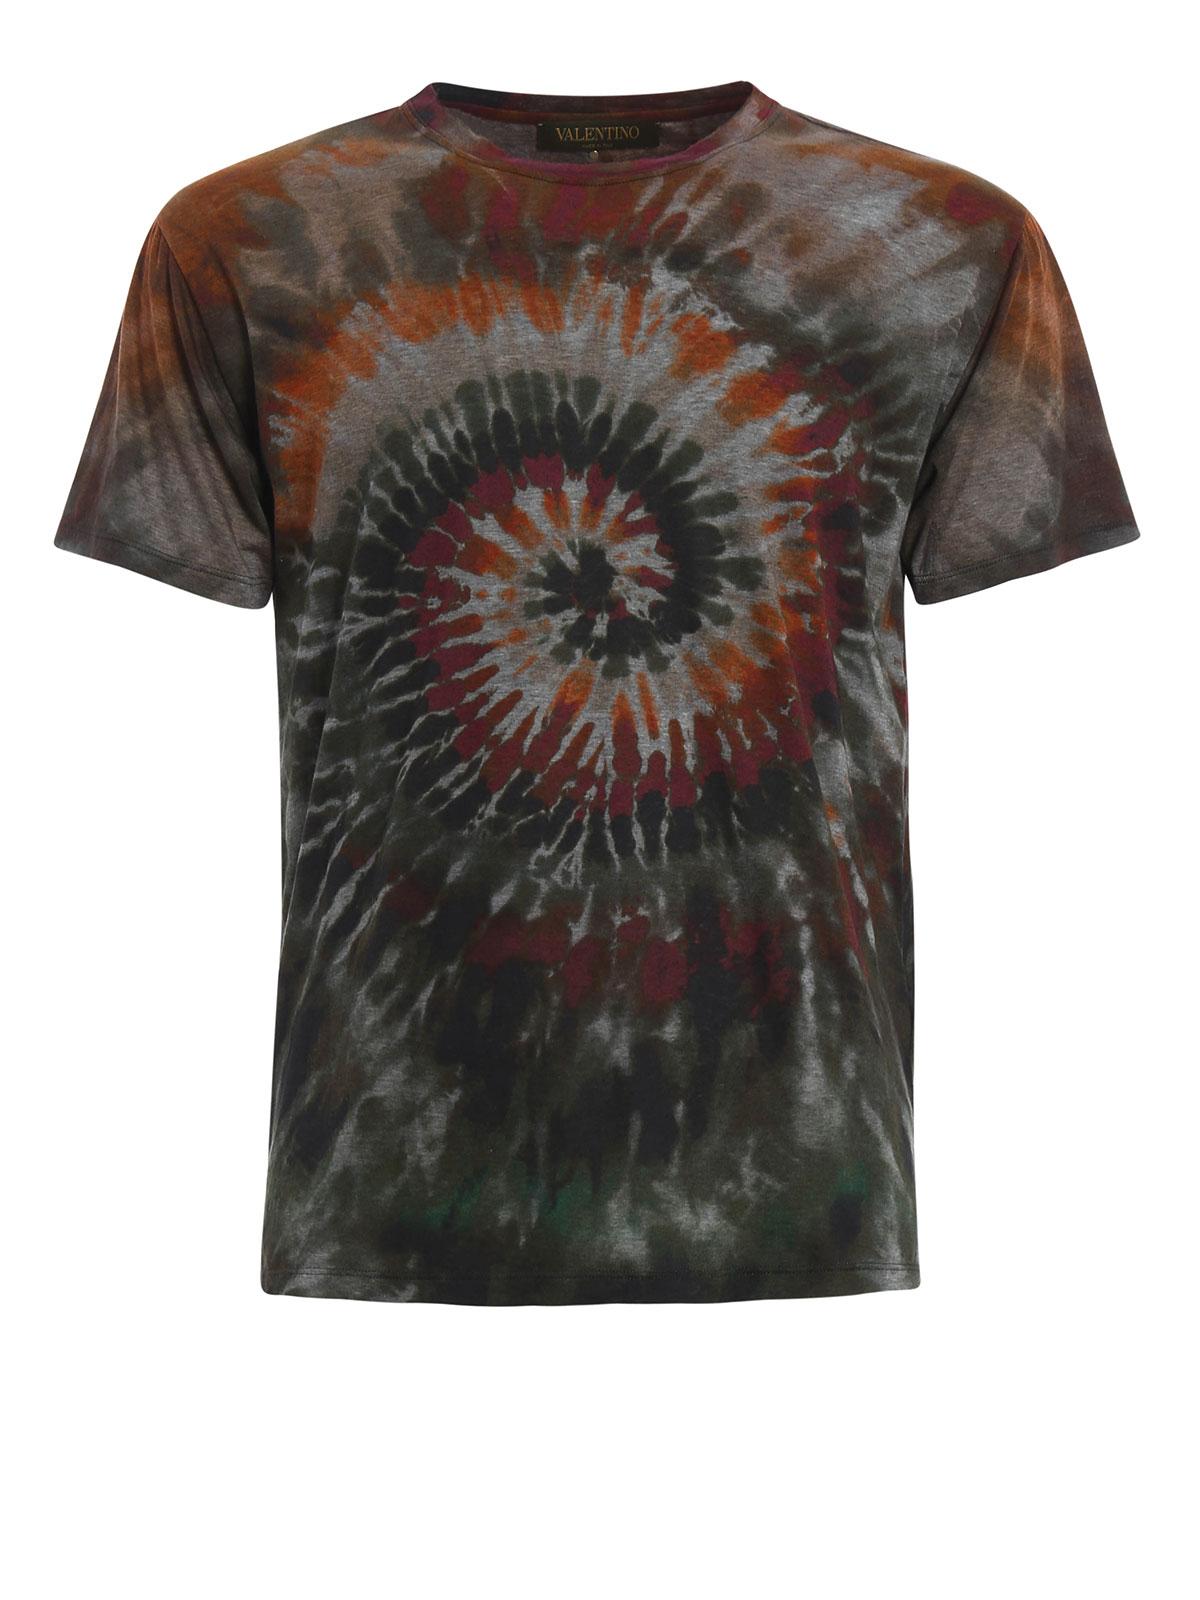 tie dye print t shirt by valentino t shirts ikrix